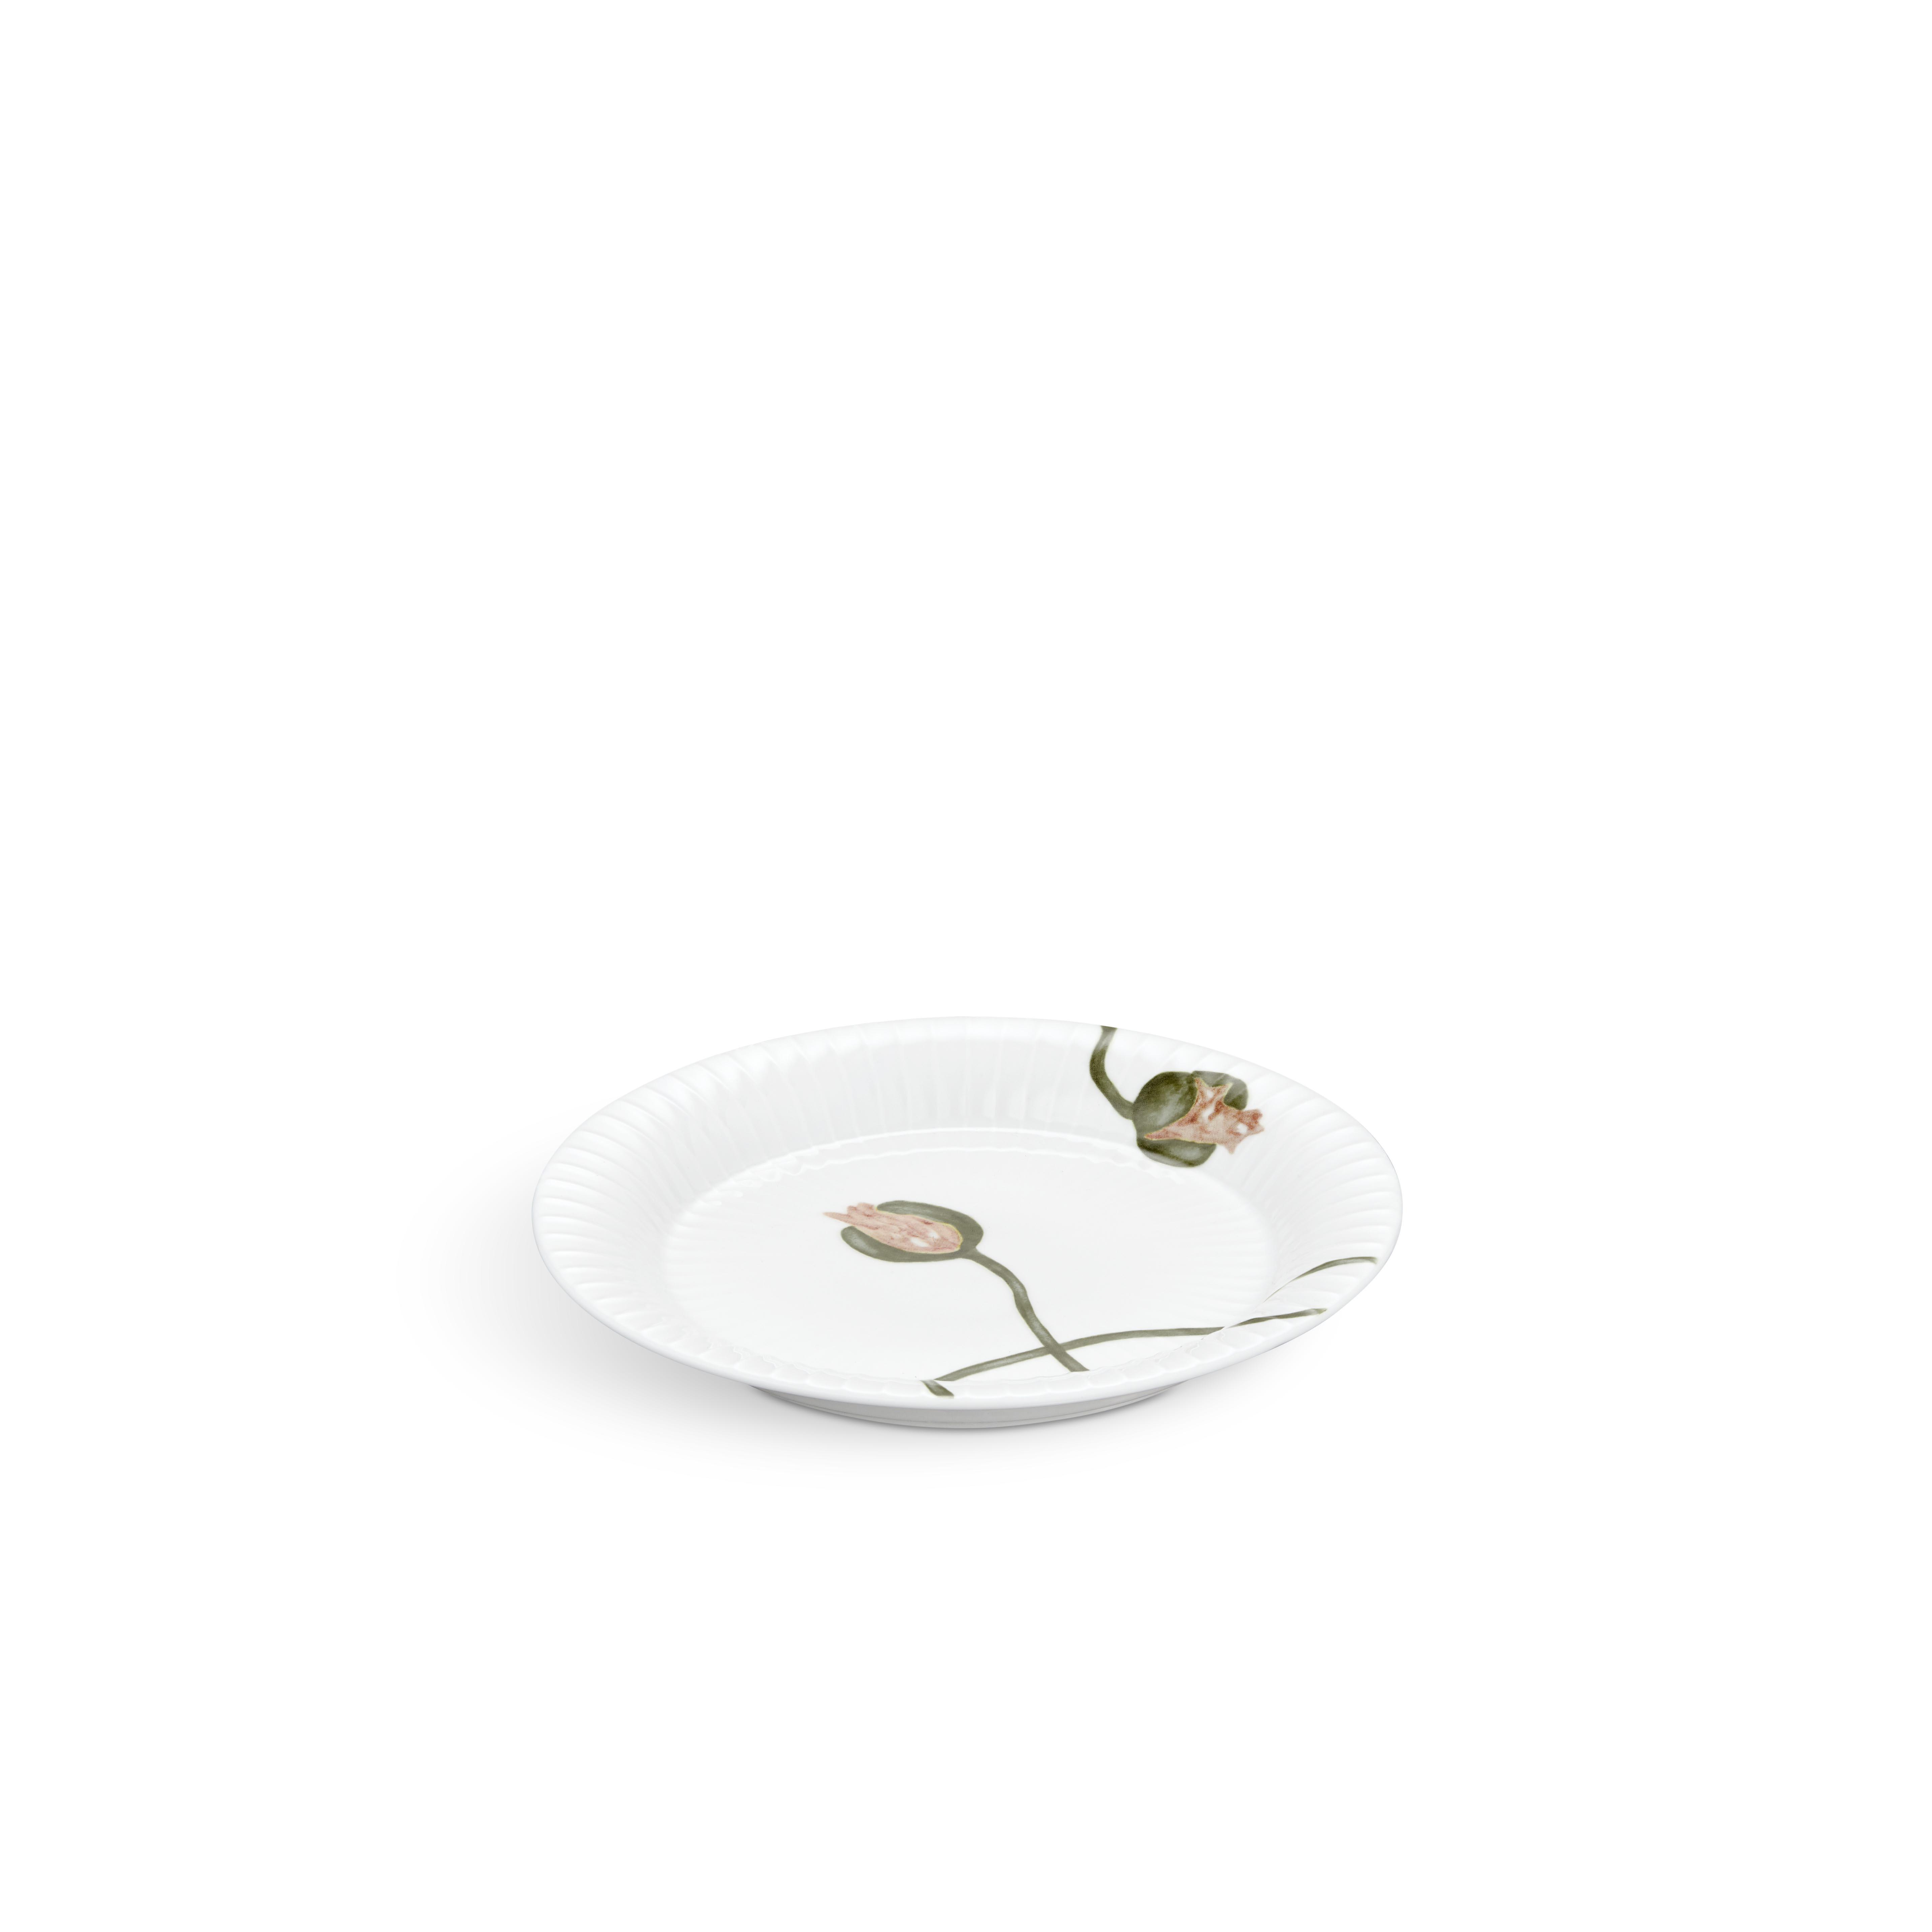 Kähler Hammershøi Poppy desserttallerken, Ø19 cm, hvid